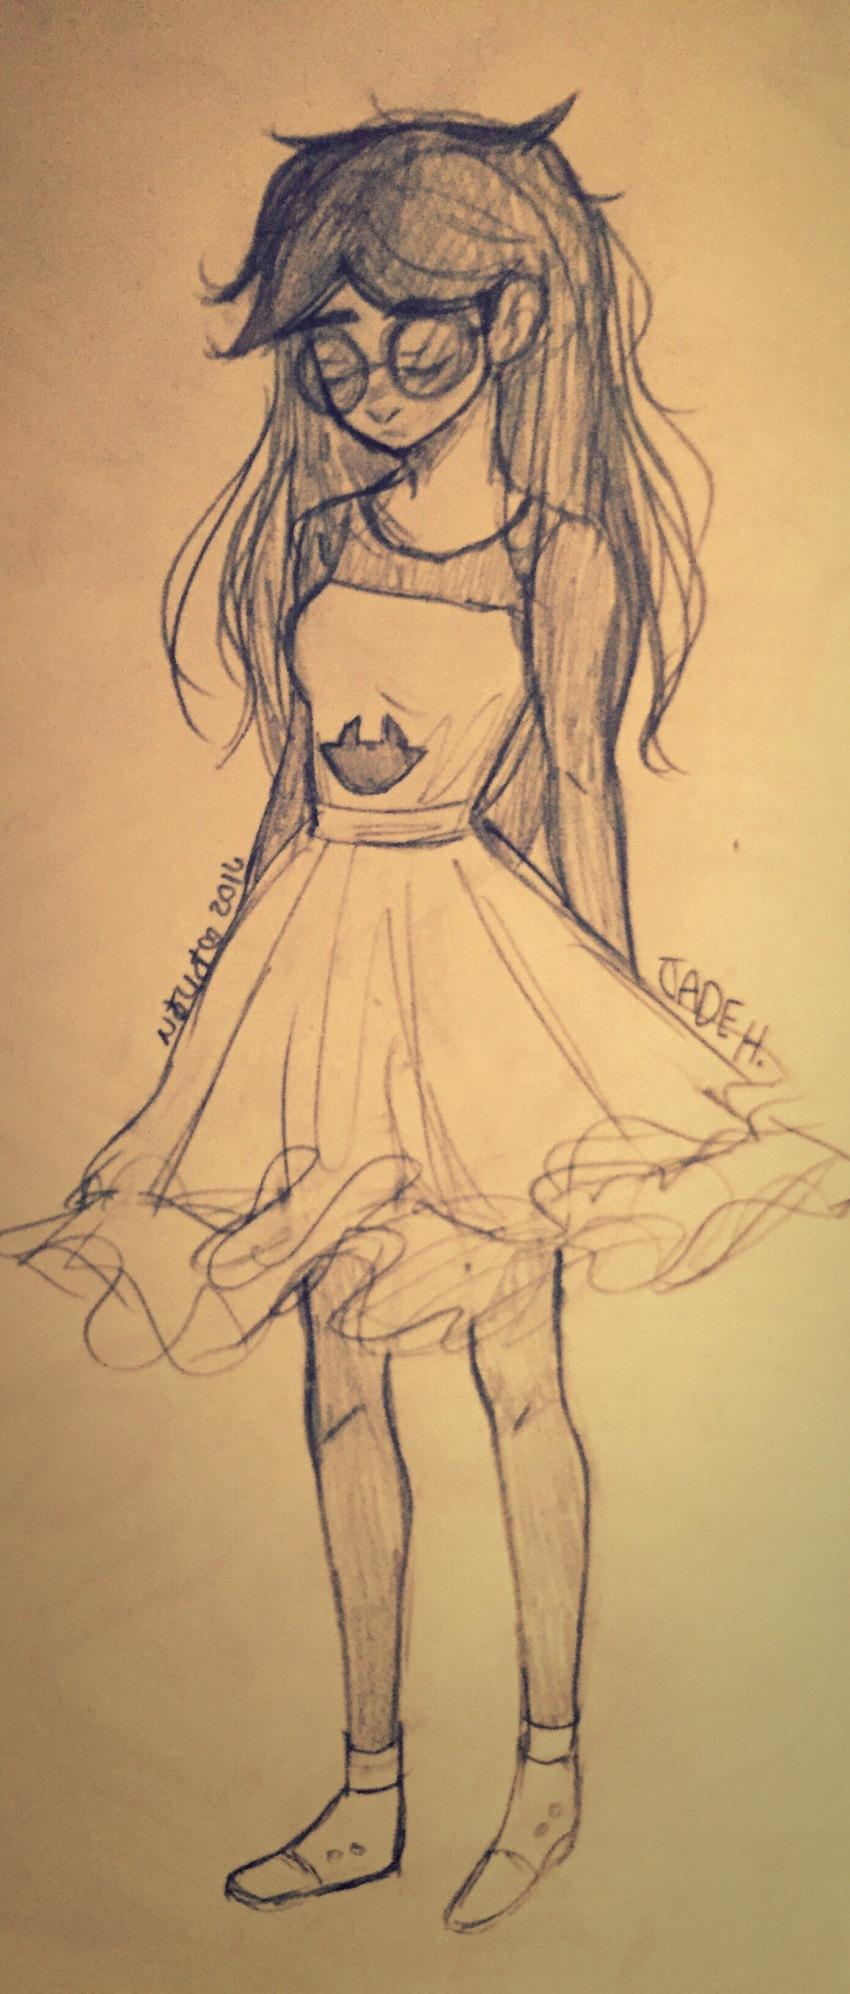 dress_of_eclectica jade_harley memori-p sketch solo